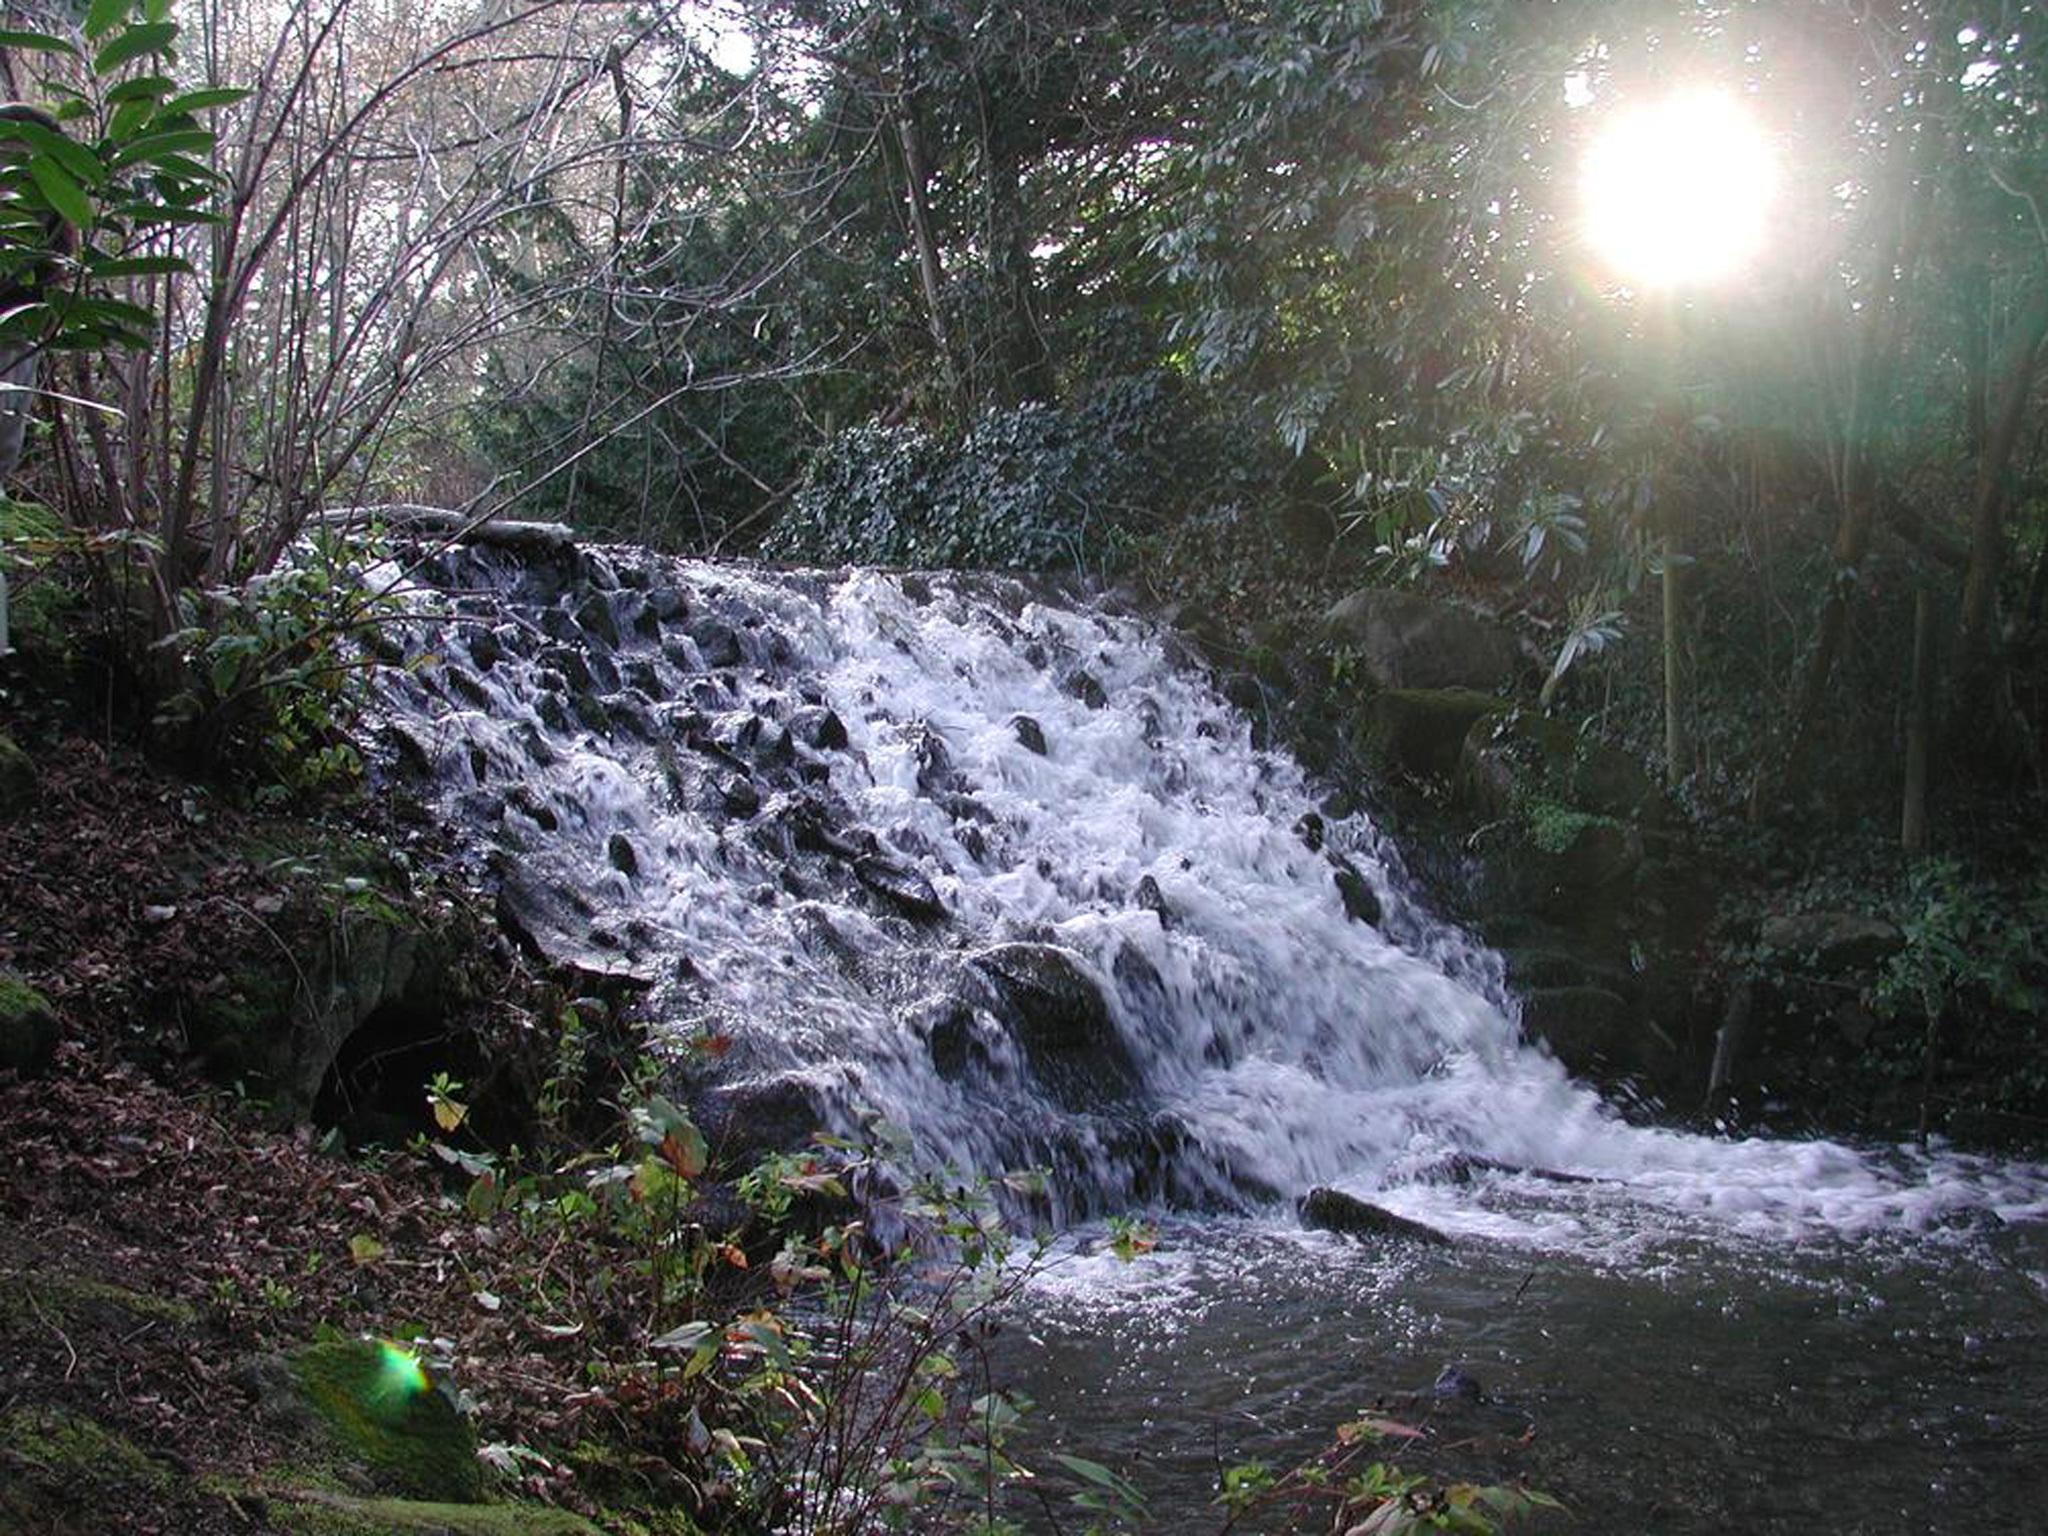 A waterfall in Marlay Park in Dublin